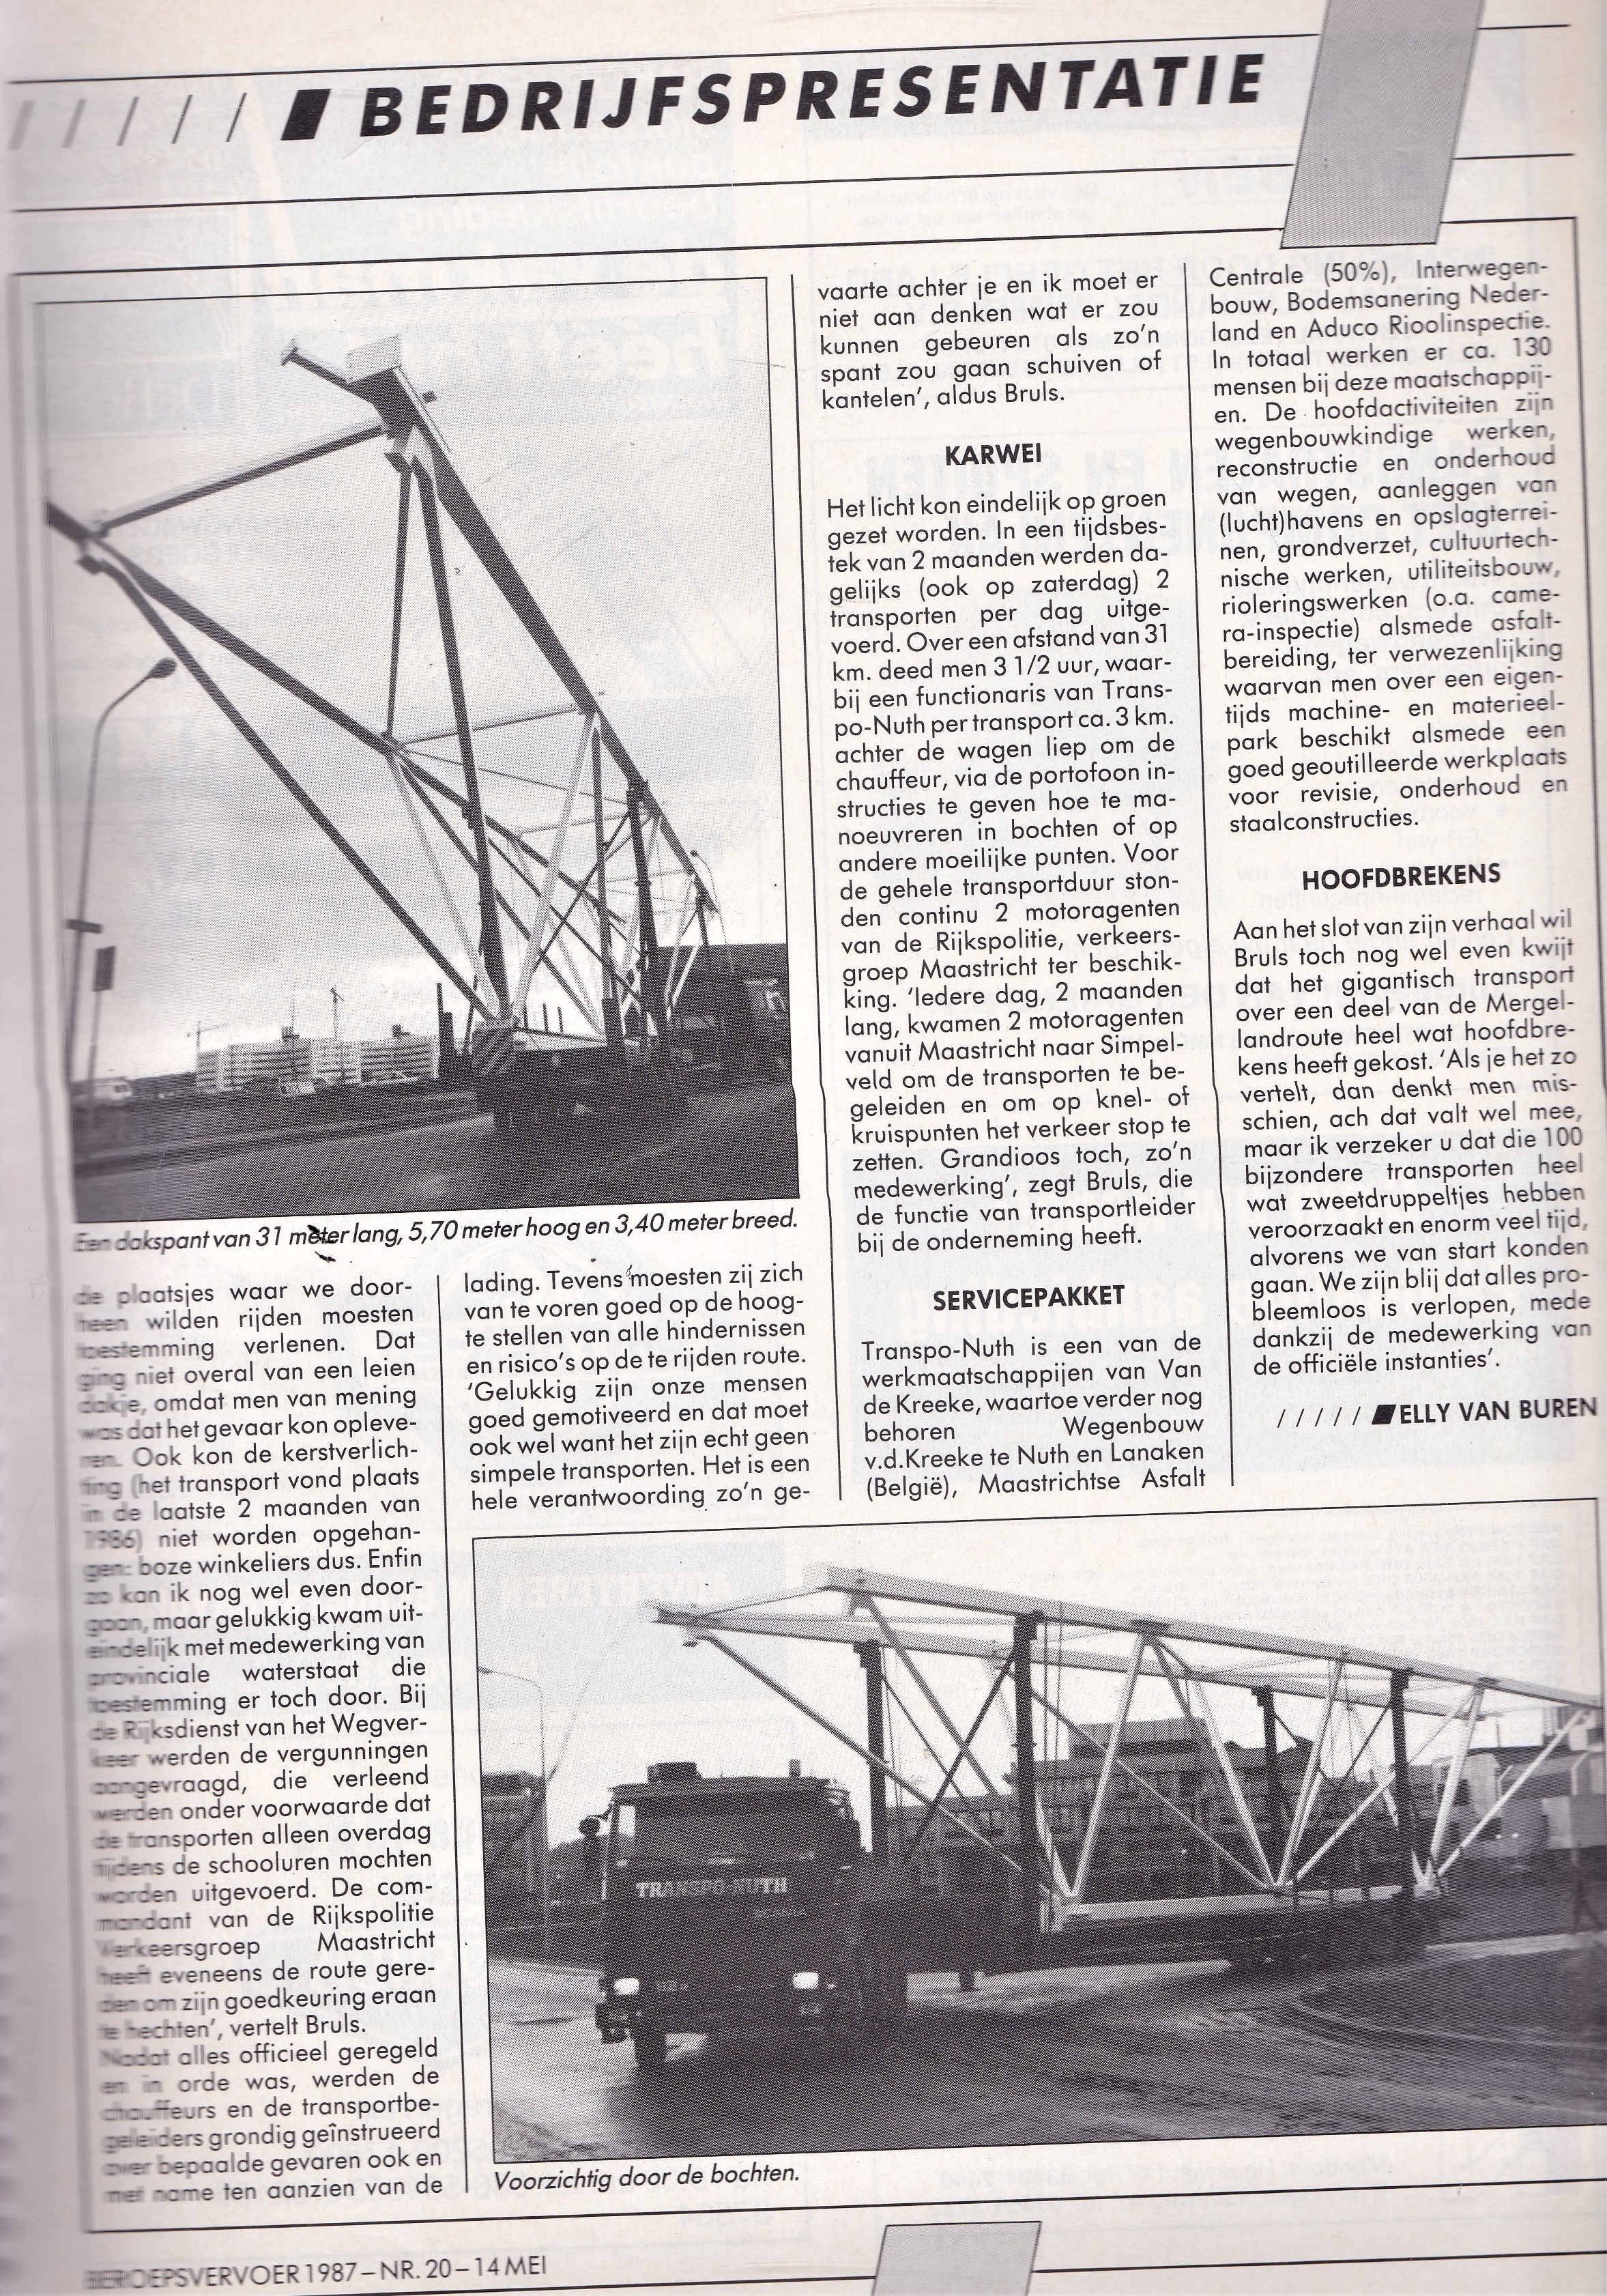 Transpo-Nuth--Mergellandroute-1988[996]